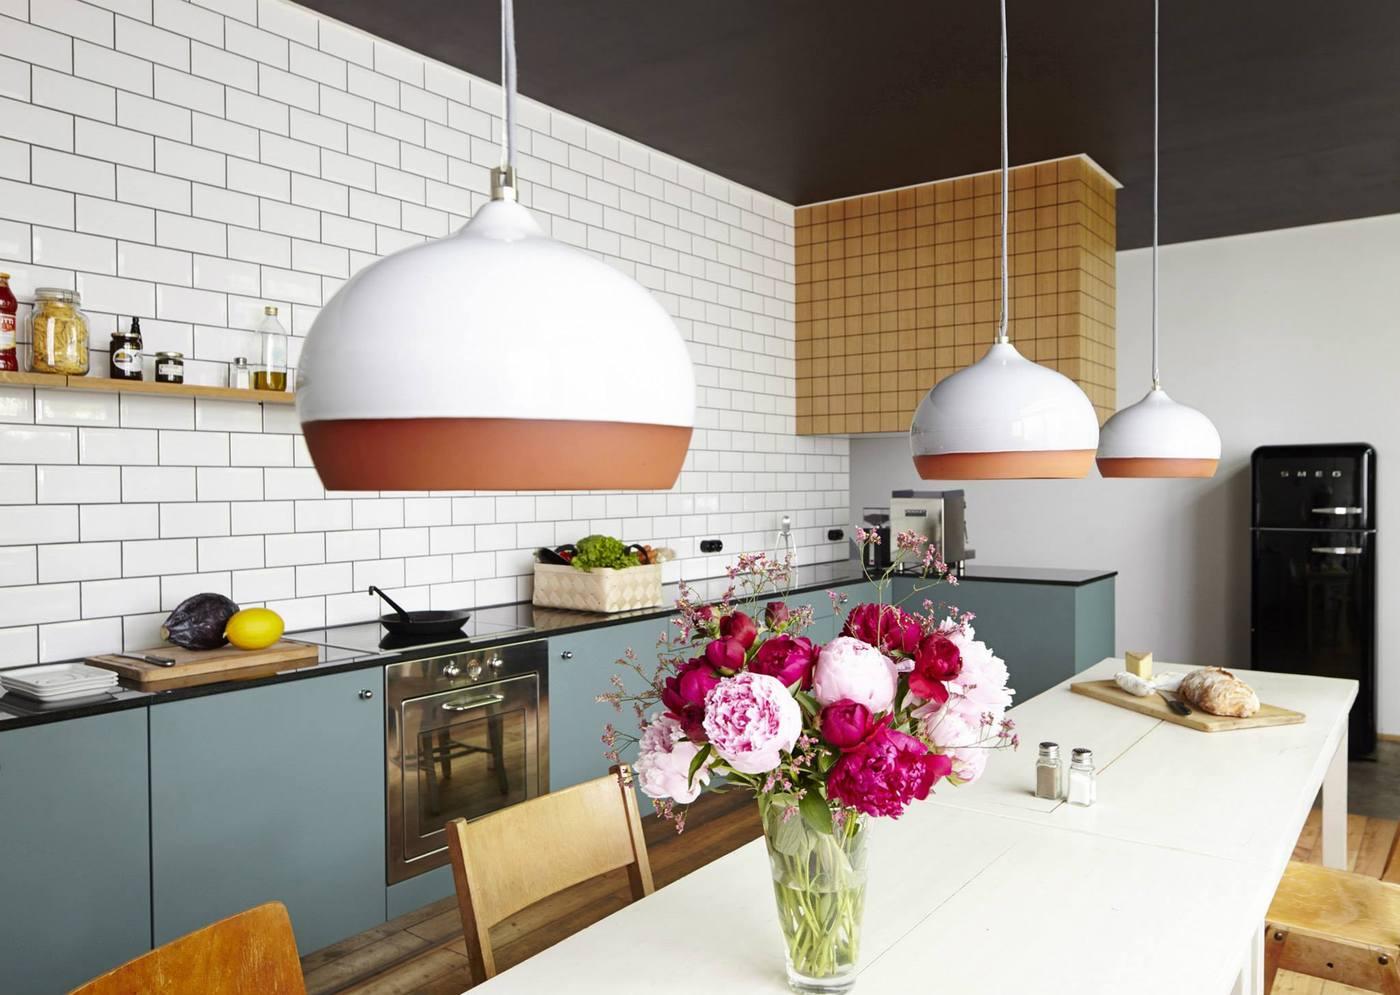 White Subway Tile Kitchen Designs are Incredibly Universal: Urban vs ...